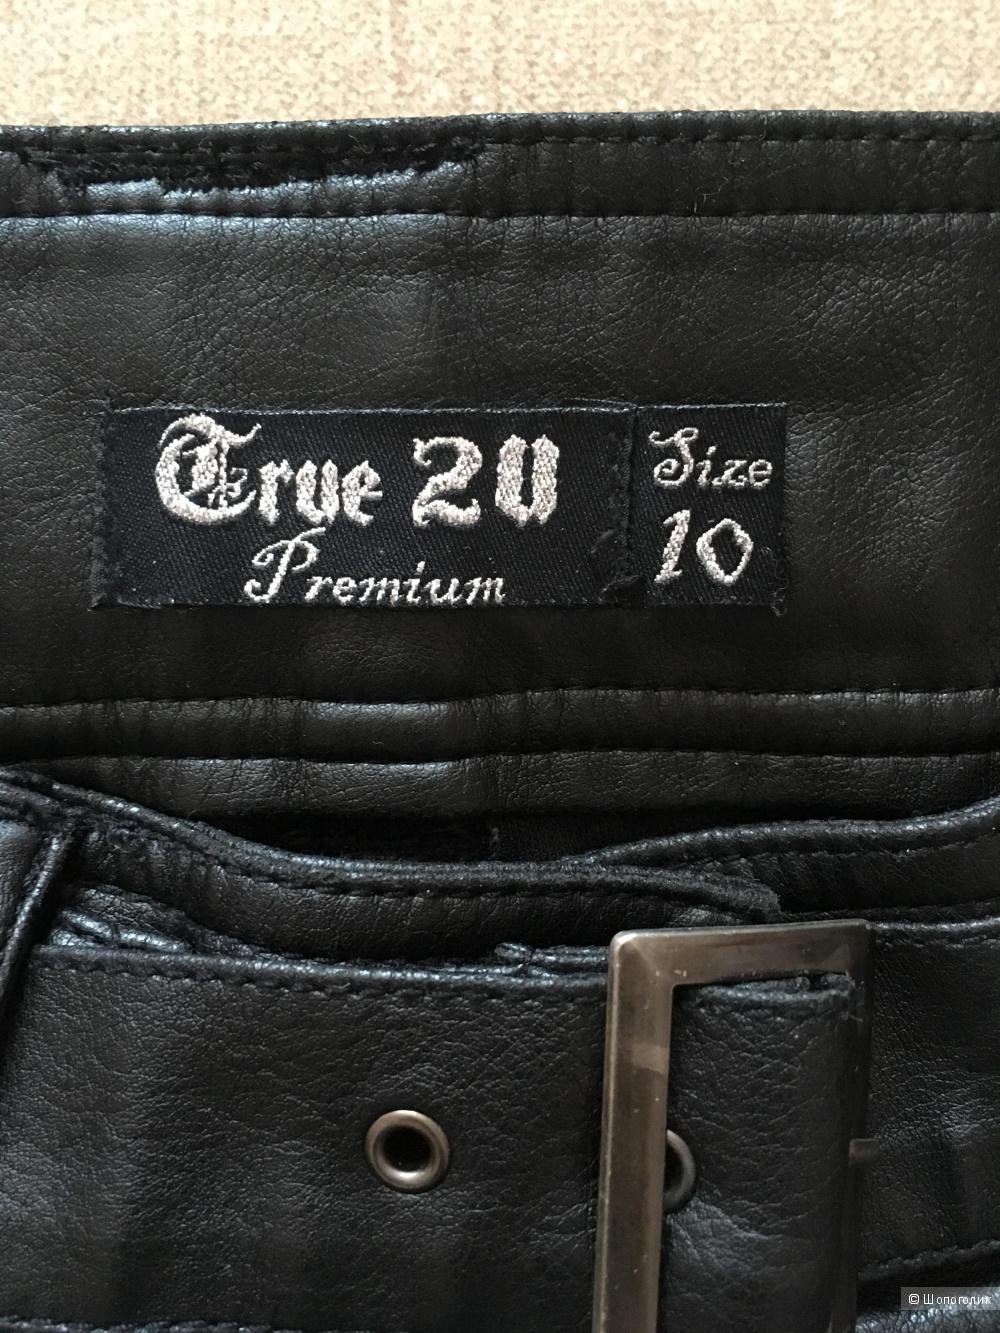 Кожаная юбка True 2 U Premium, 44 размер